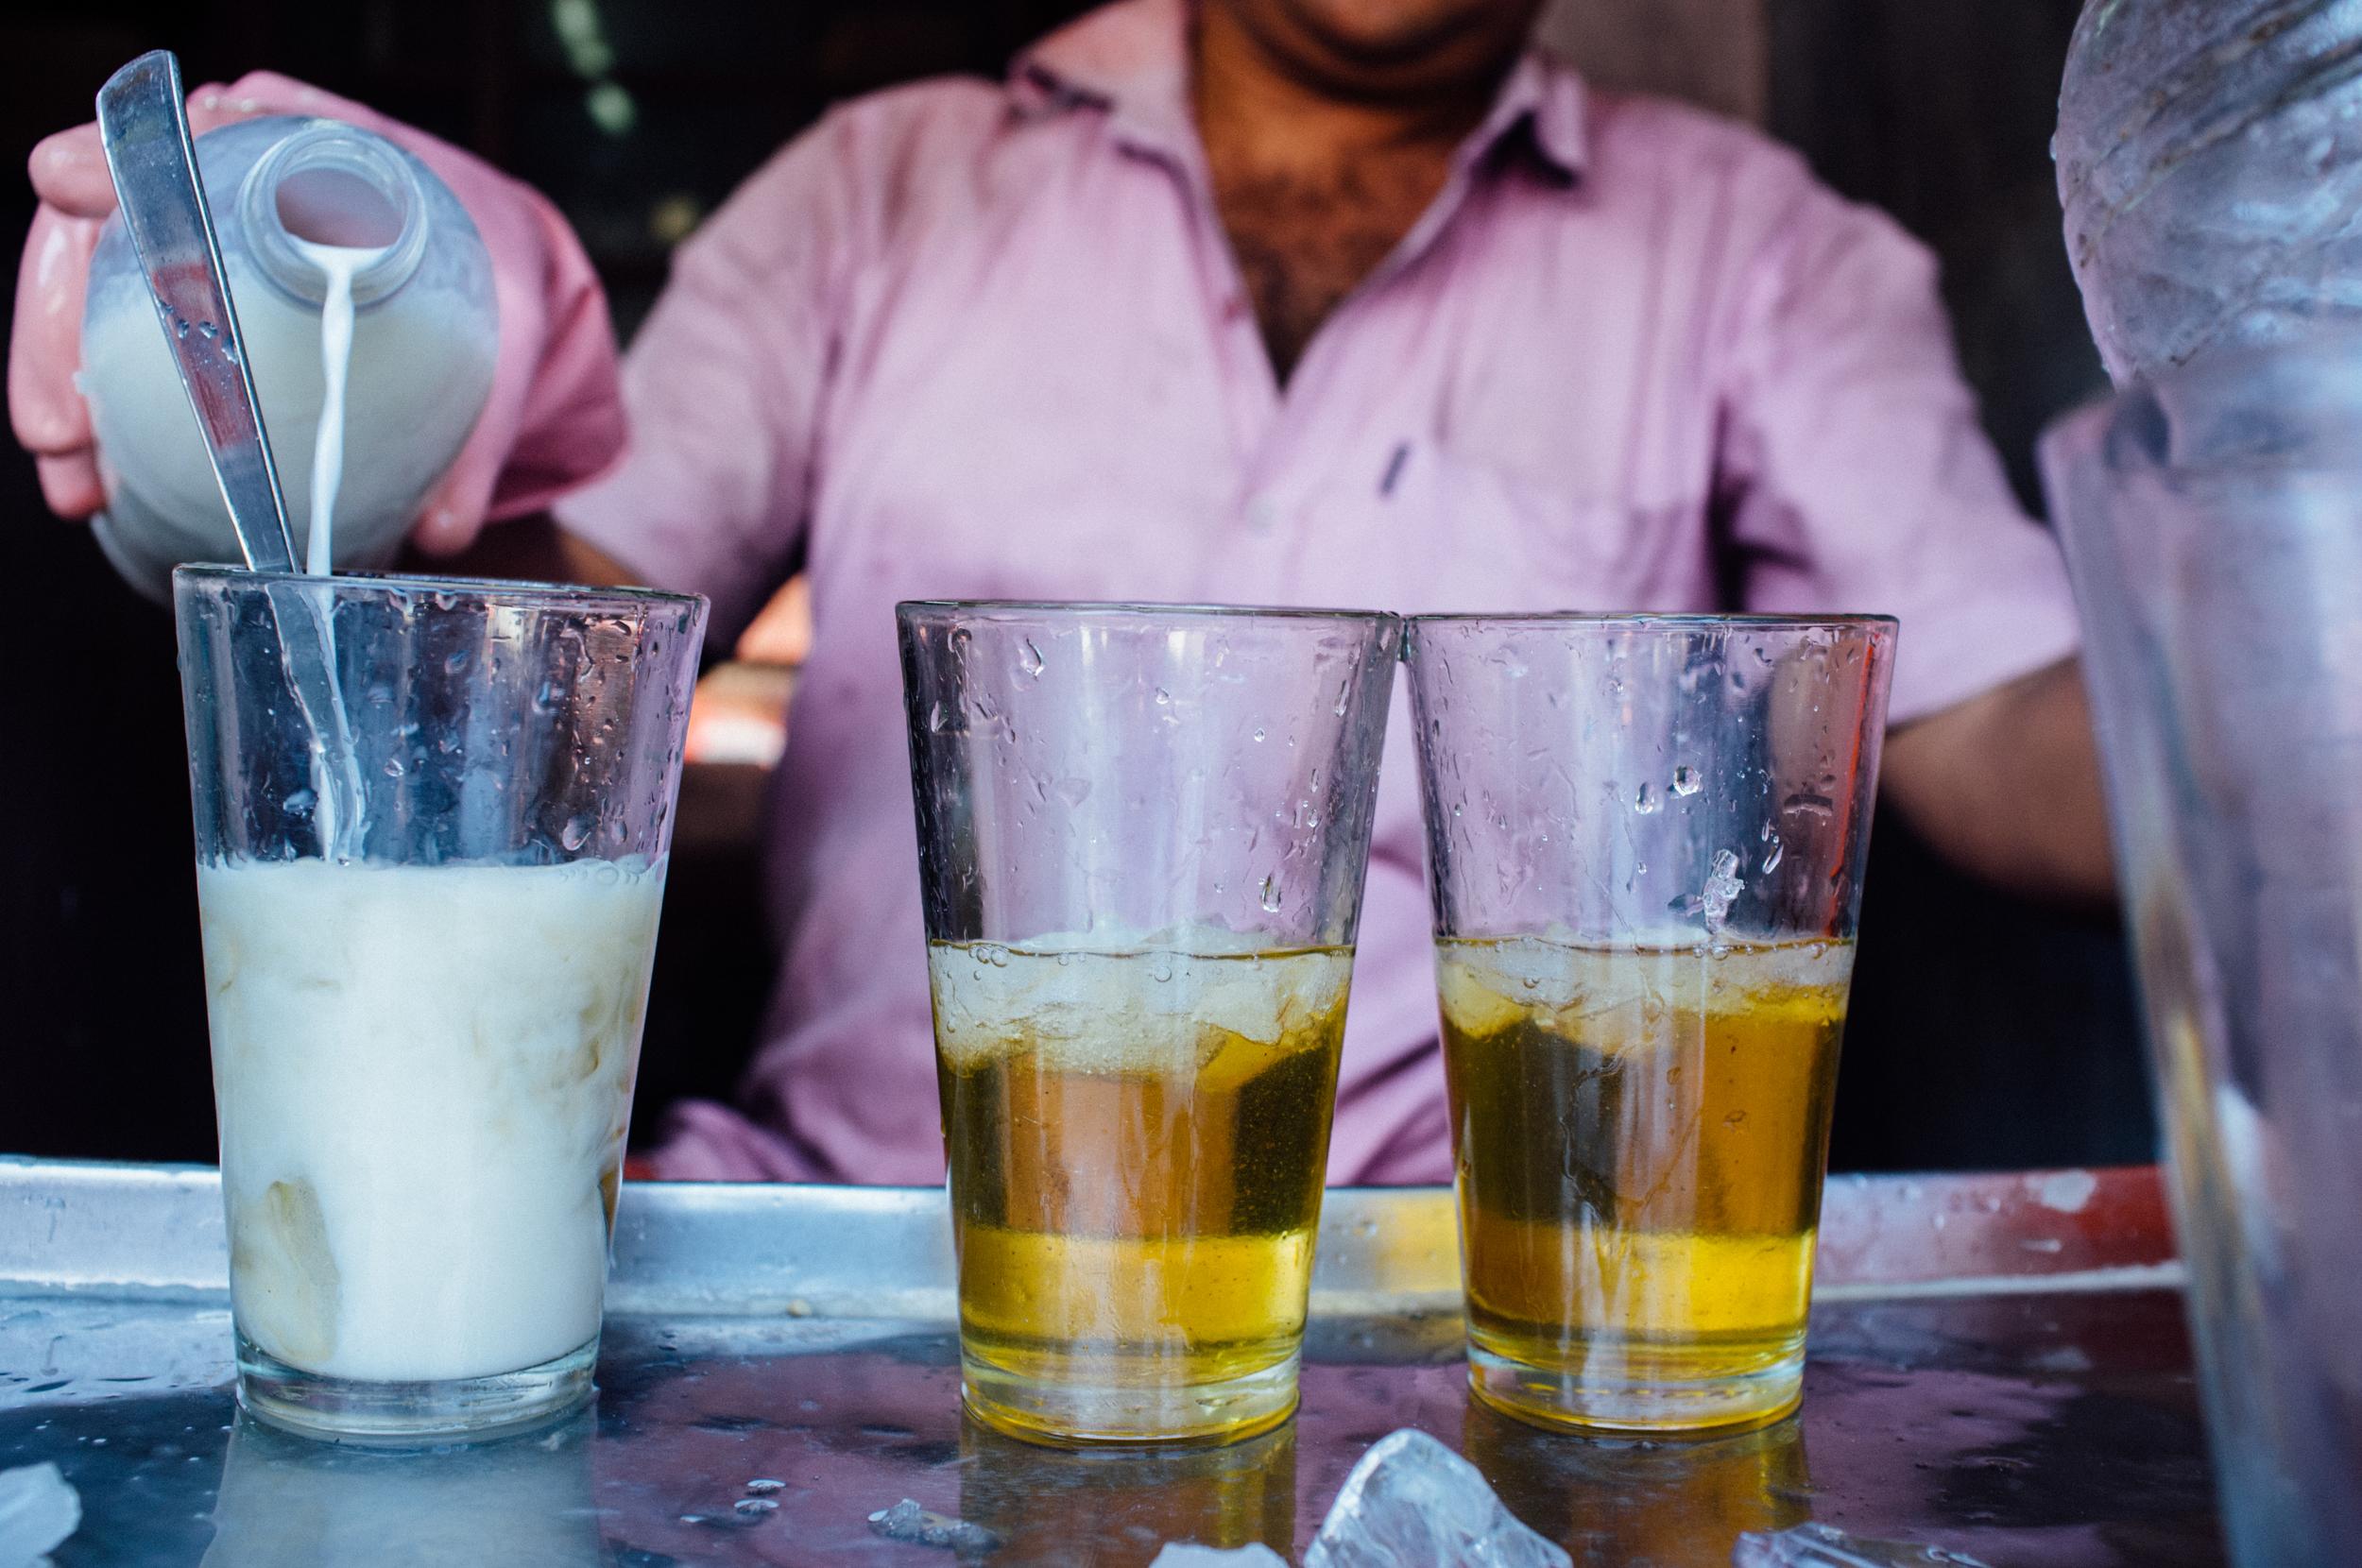 Paal sarbath (milk sarbath)